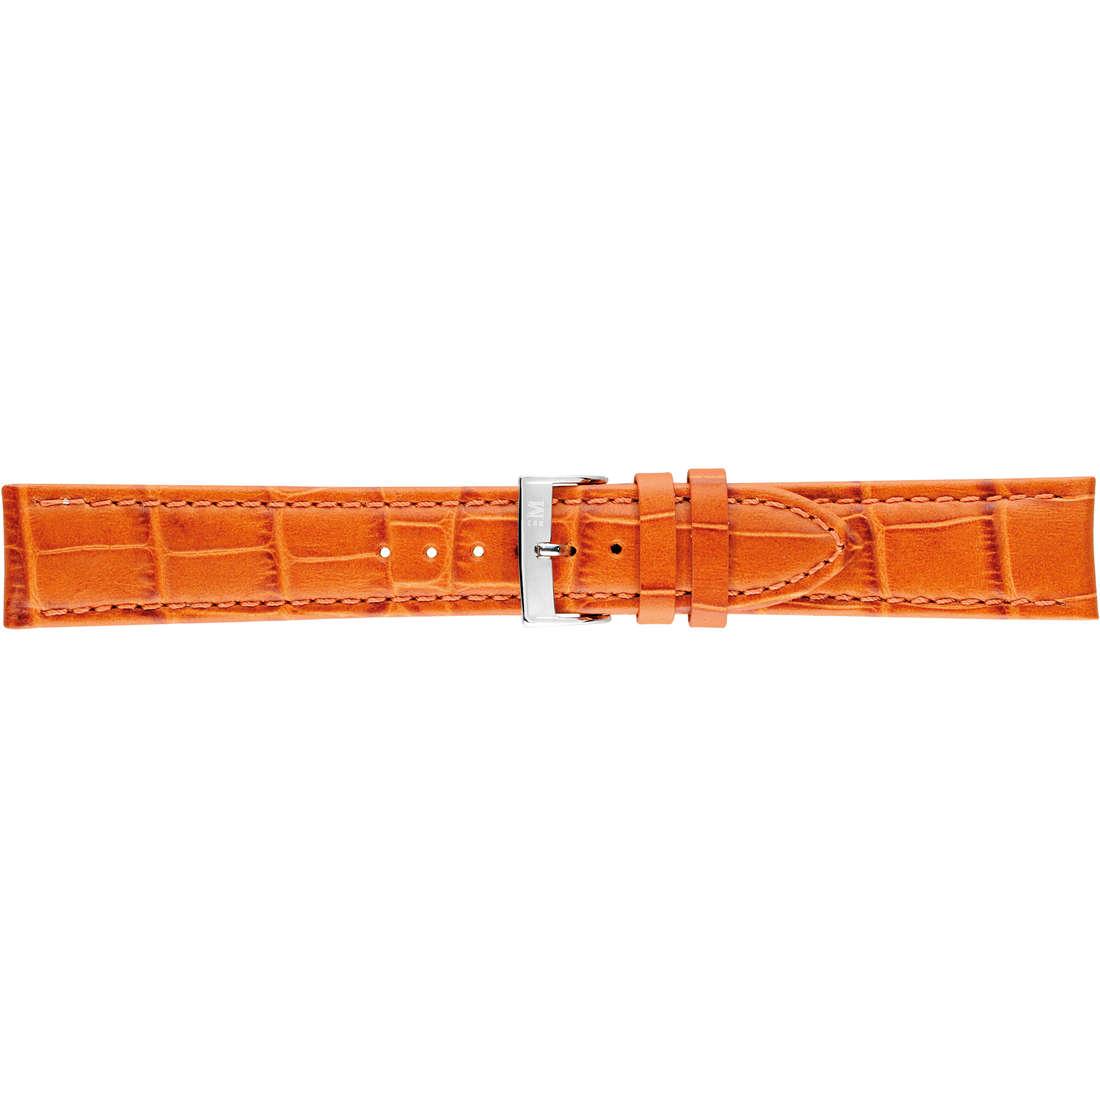 watch watch bands watch straps man Morellato Morellato 1930 A01X2269480086CR16